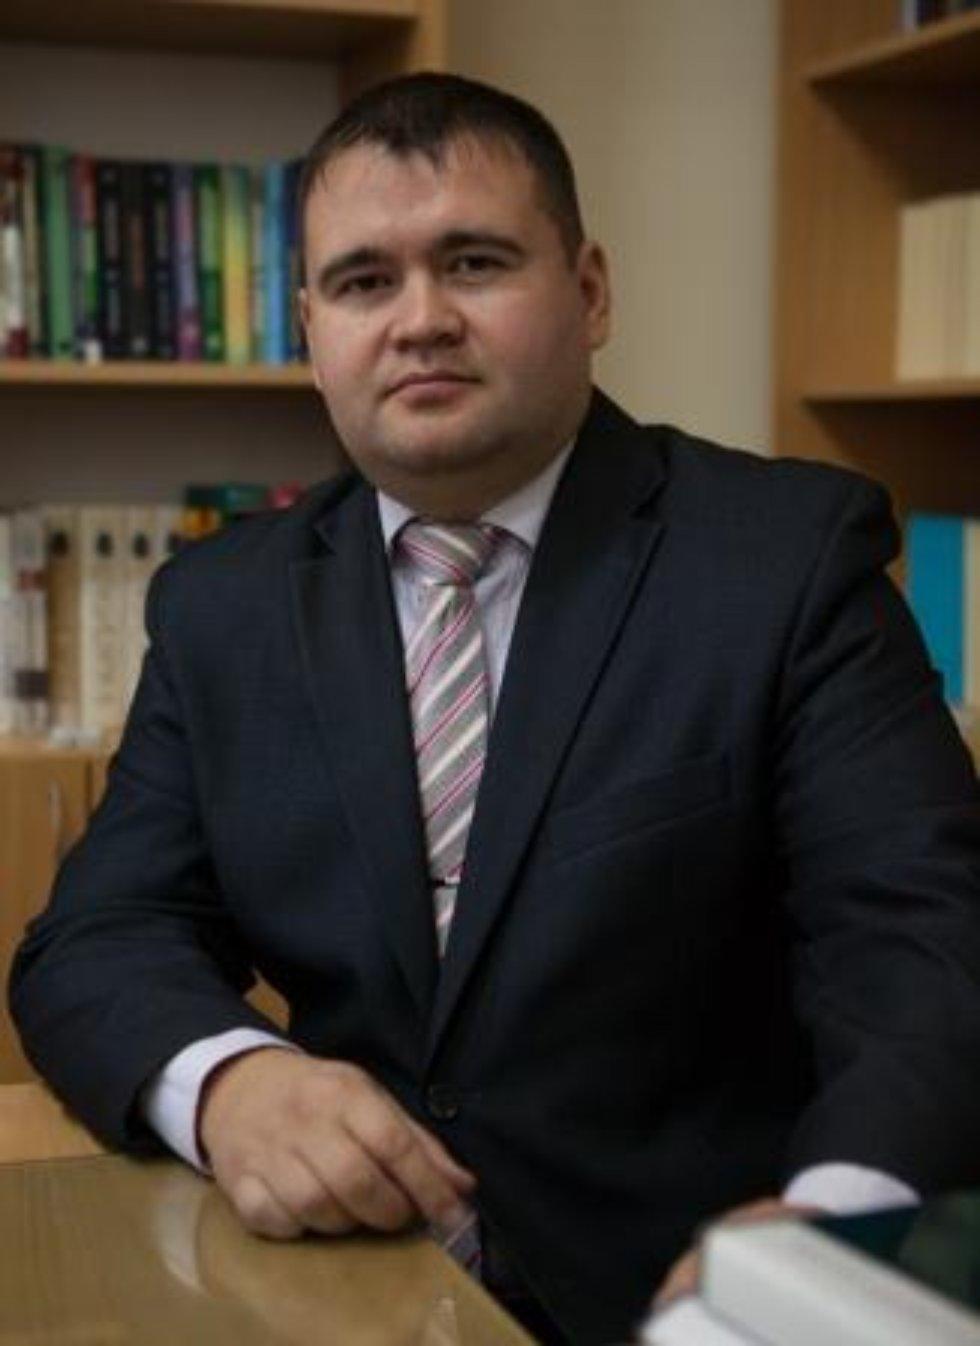 Gapsalamov Almaz Rafisovich